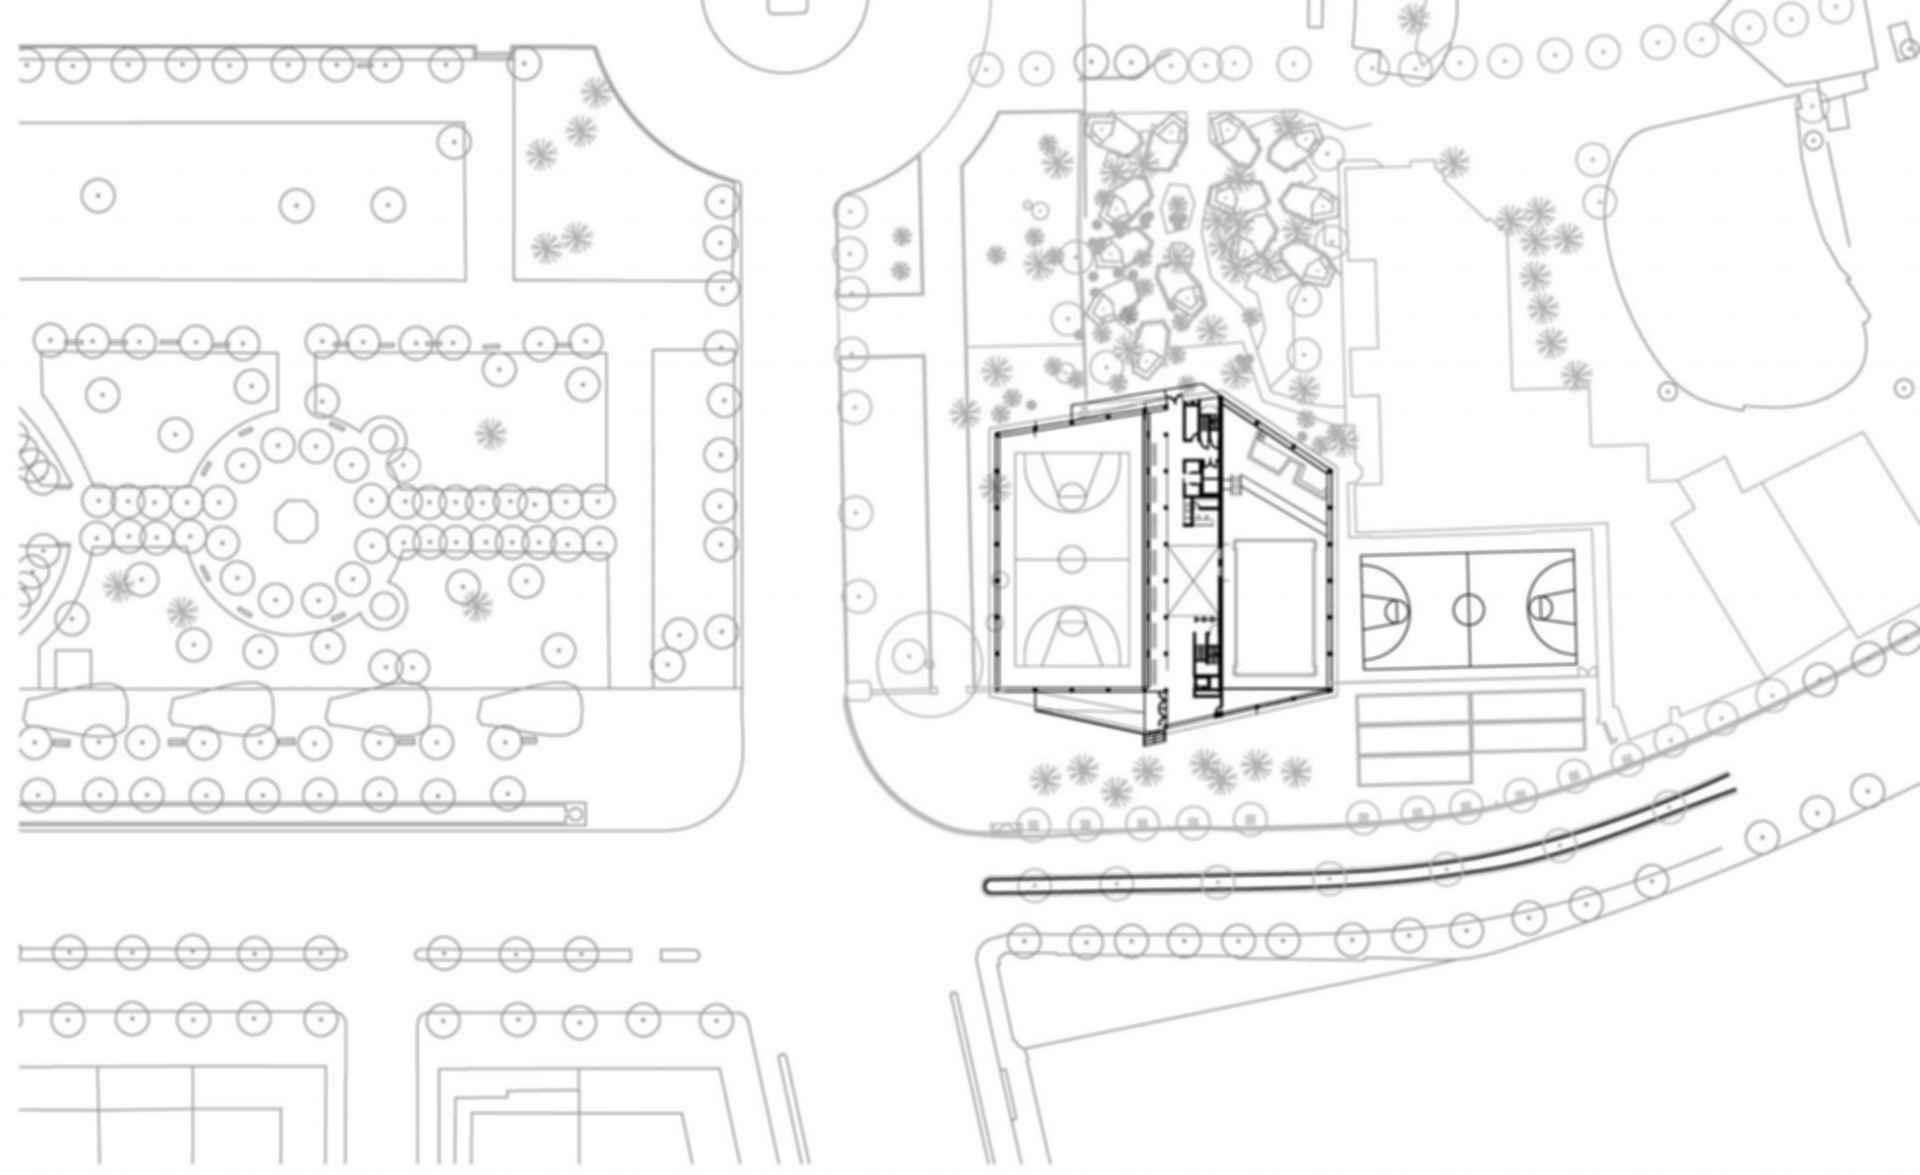 Ciutadella Park Sports Center - Site Plan